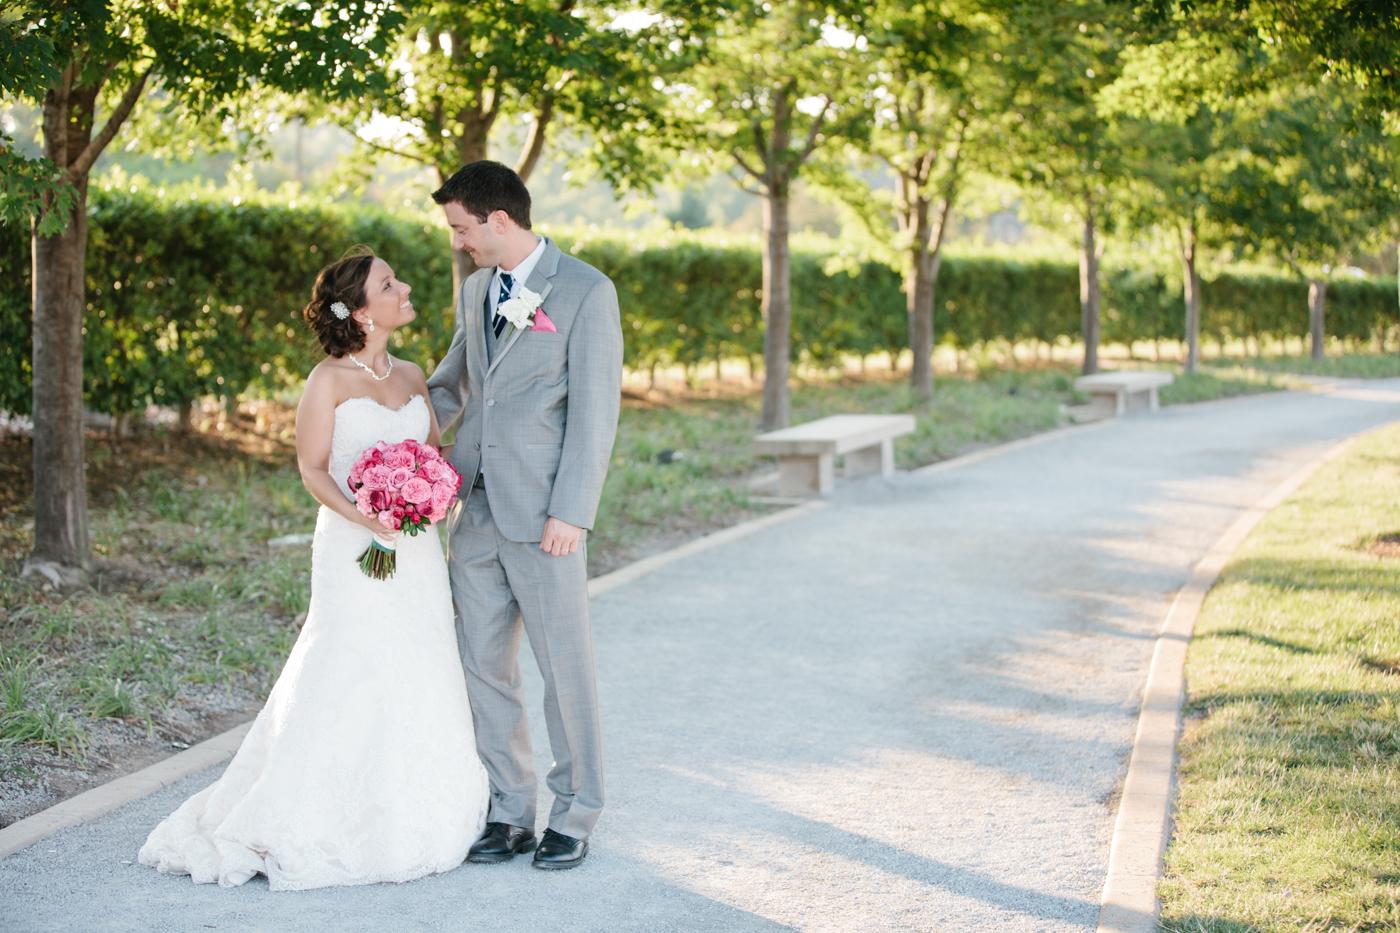 Amazing Wedding Dress St Louis Motif - All Wedding Dresses ...